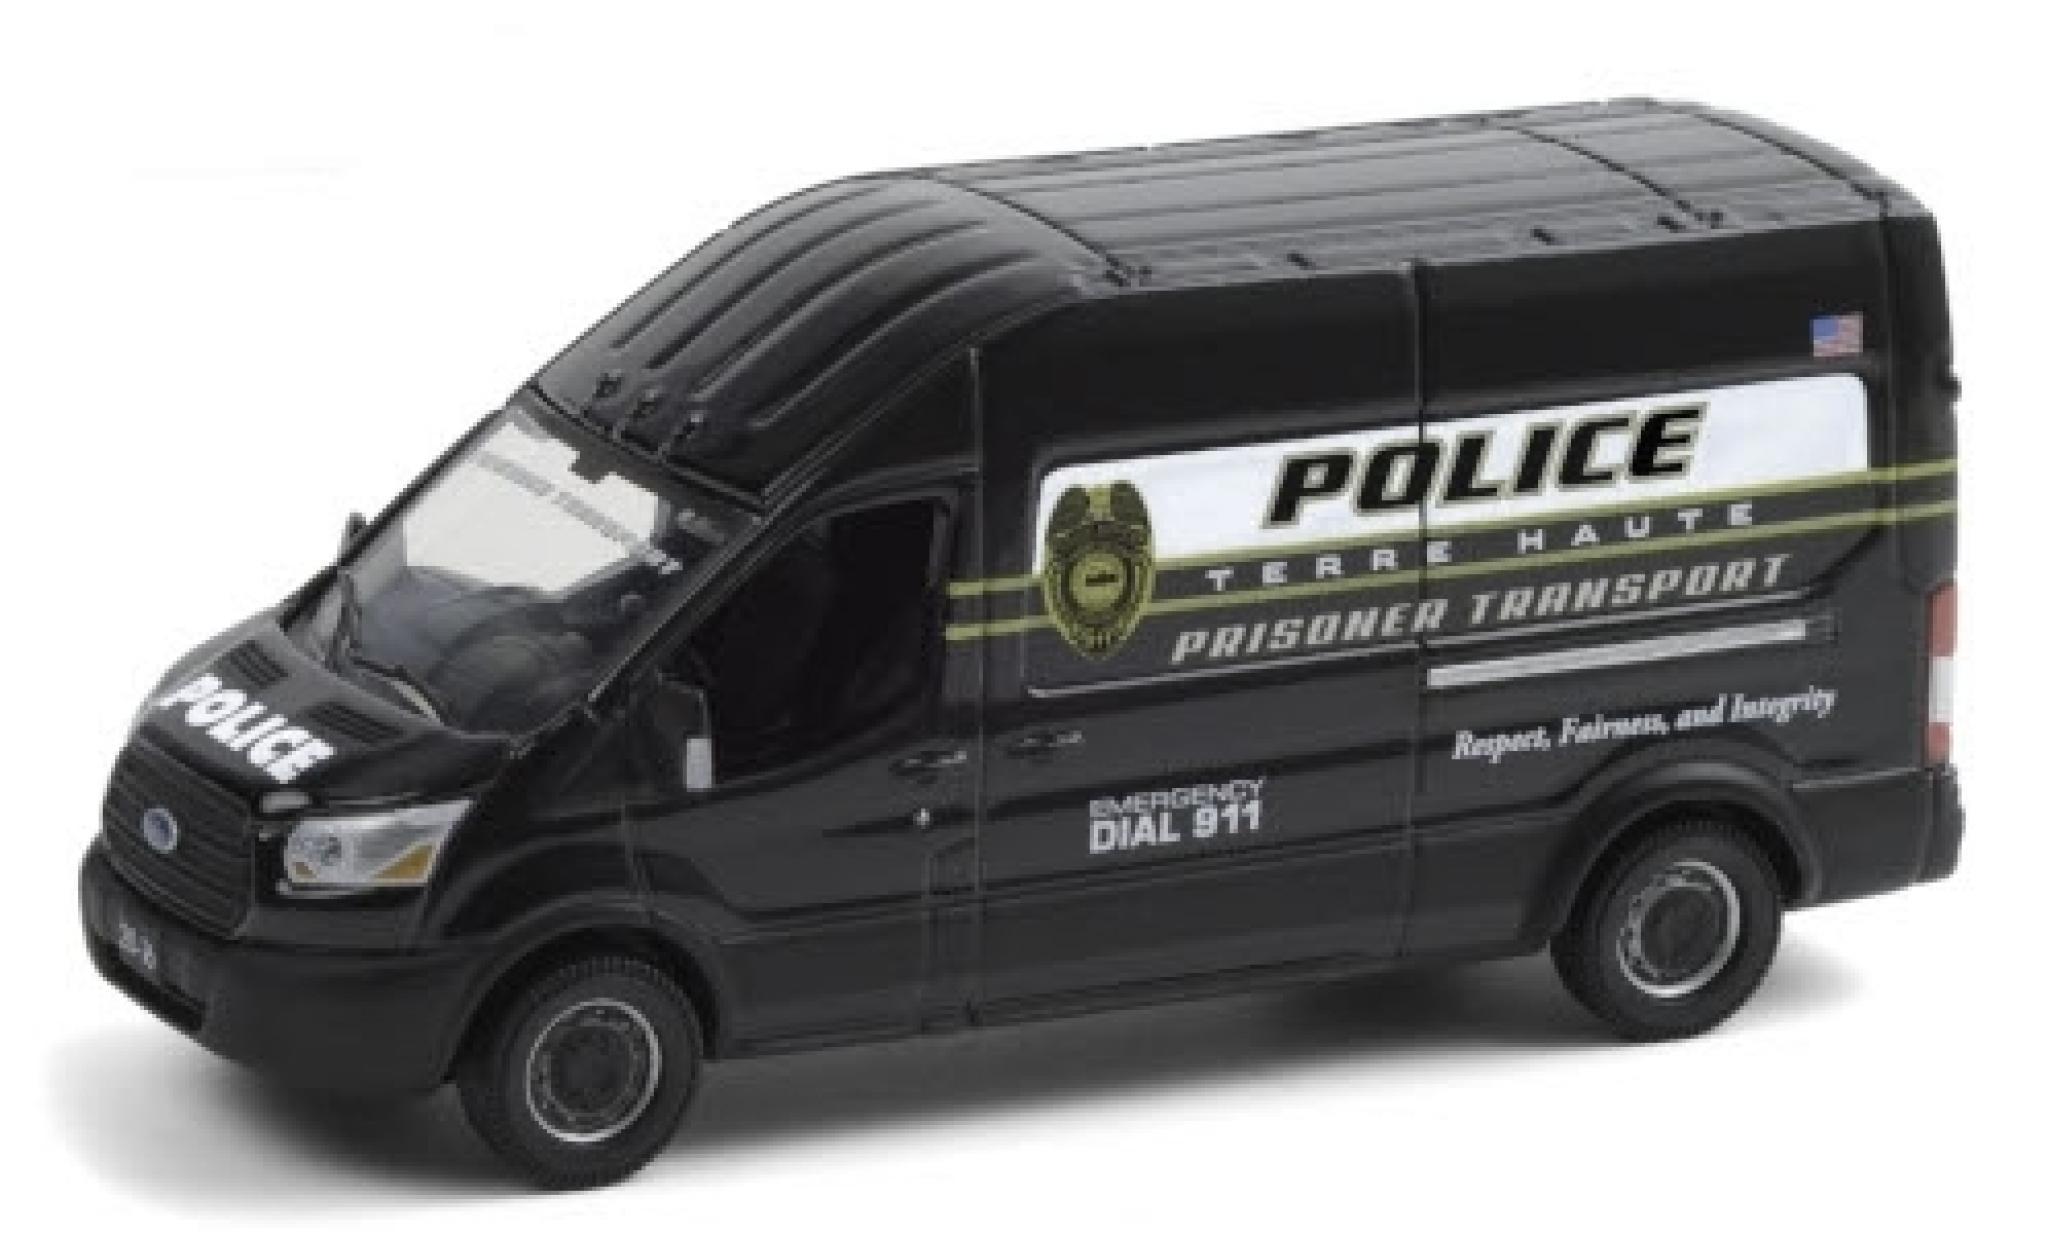 Ford Transit 1/64 Greenlight LWB HD Terre Haute Police Department 2020 Prisoner Transport